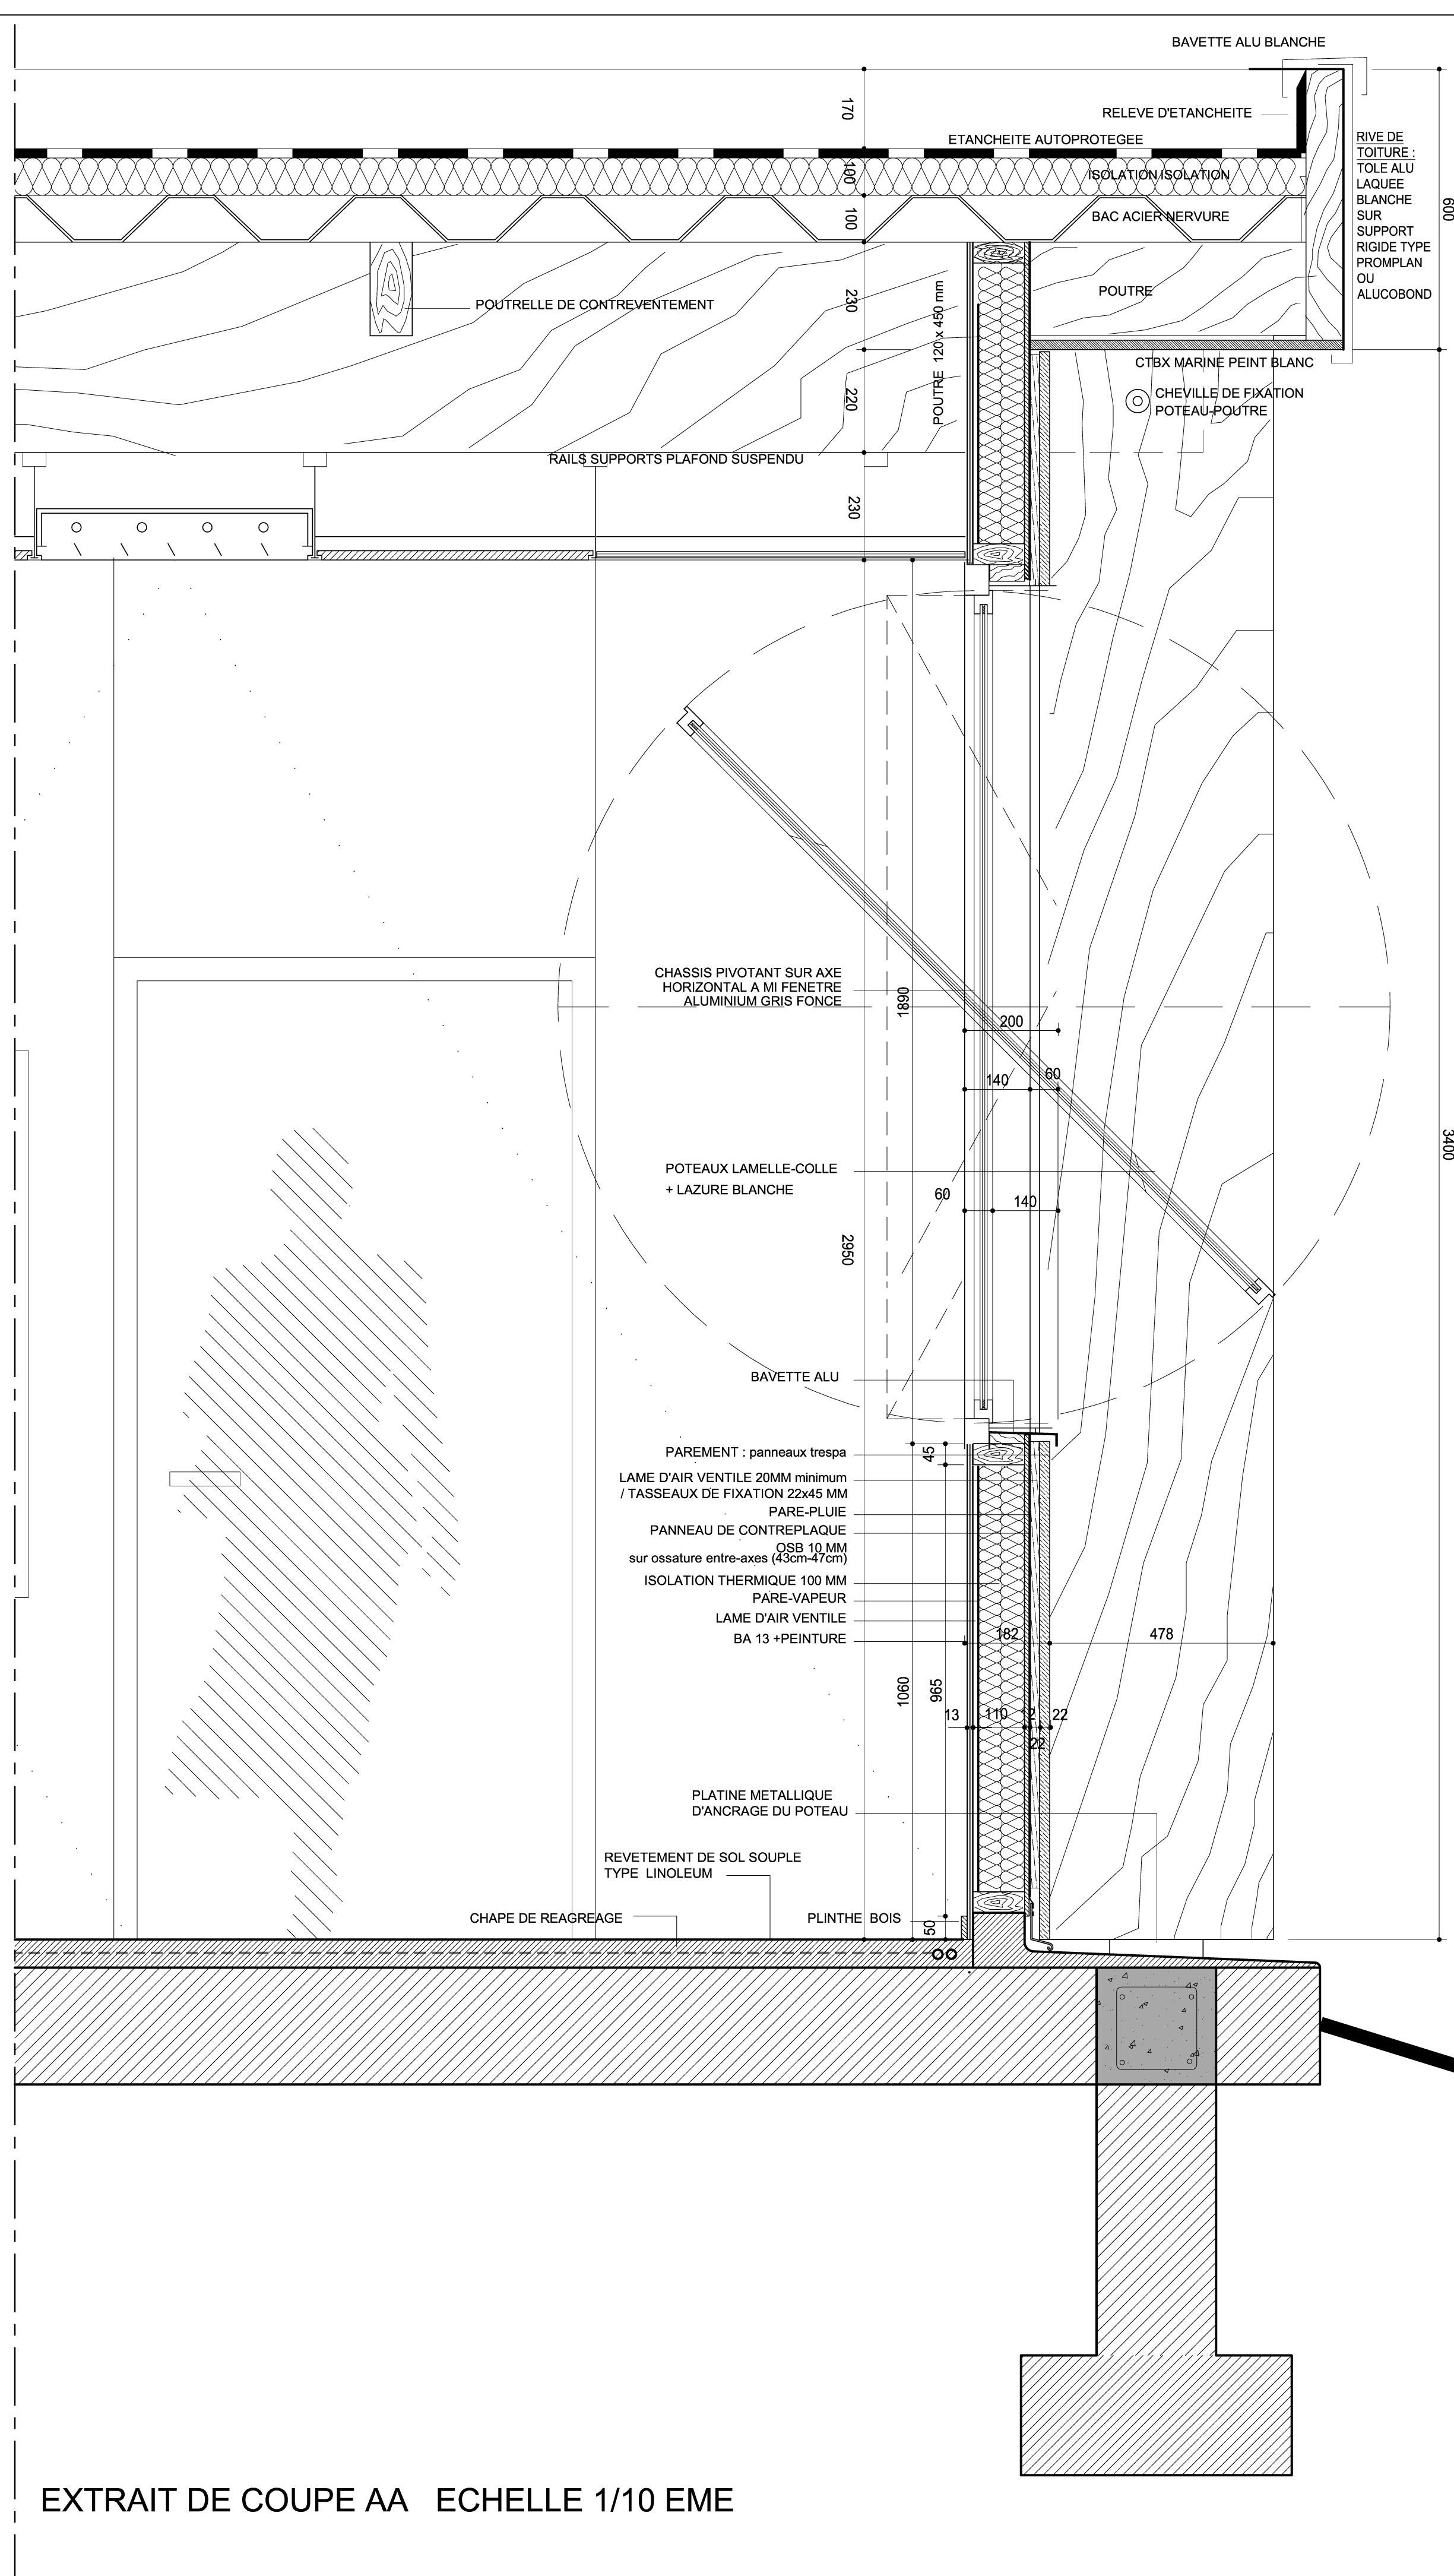 LONGPONT_Detail